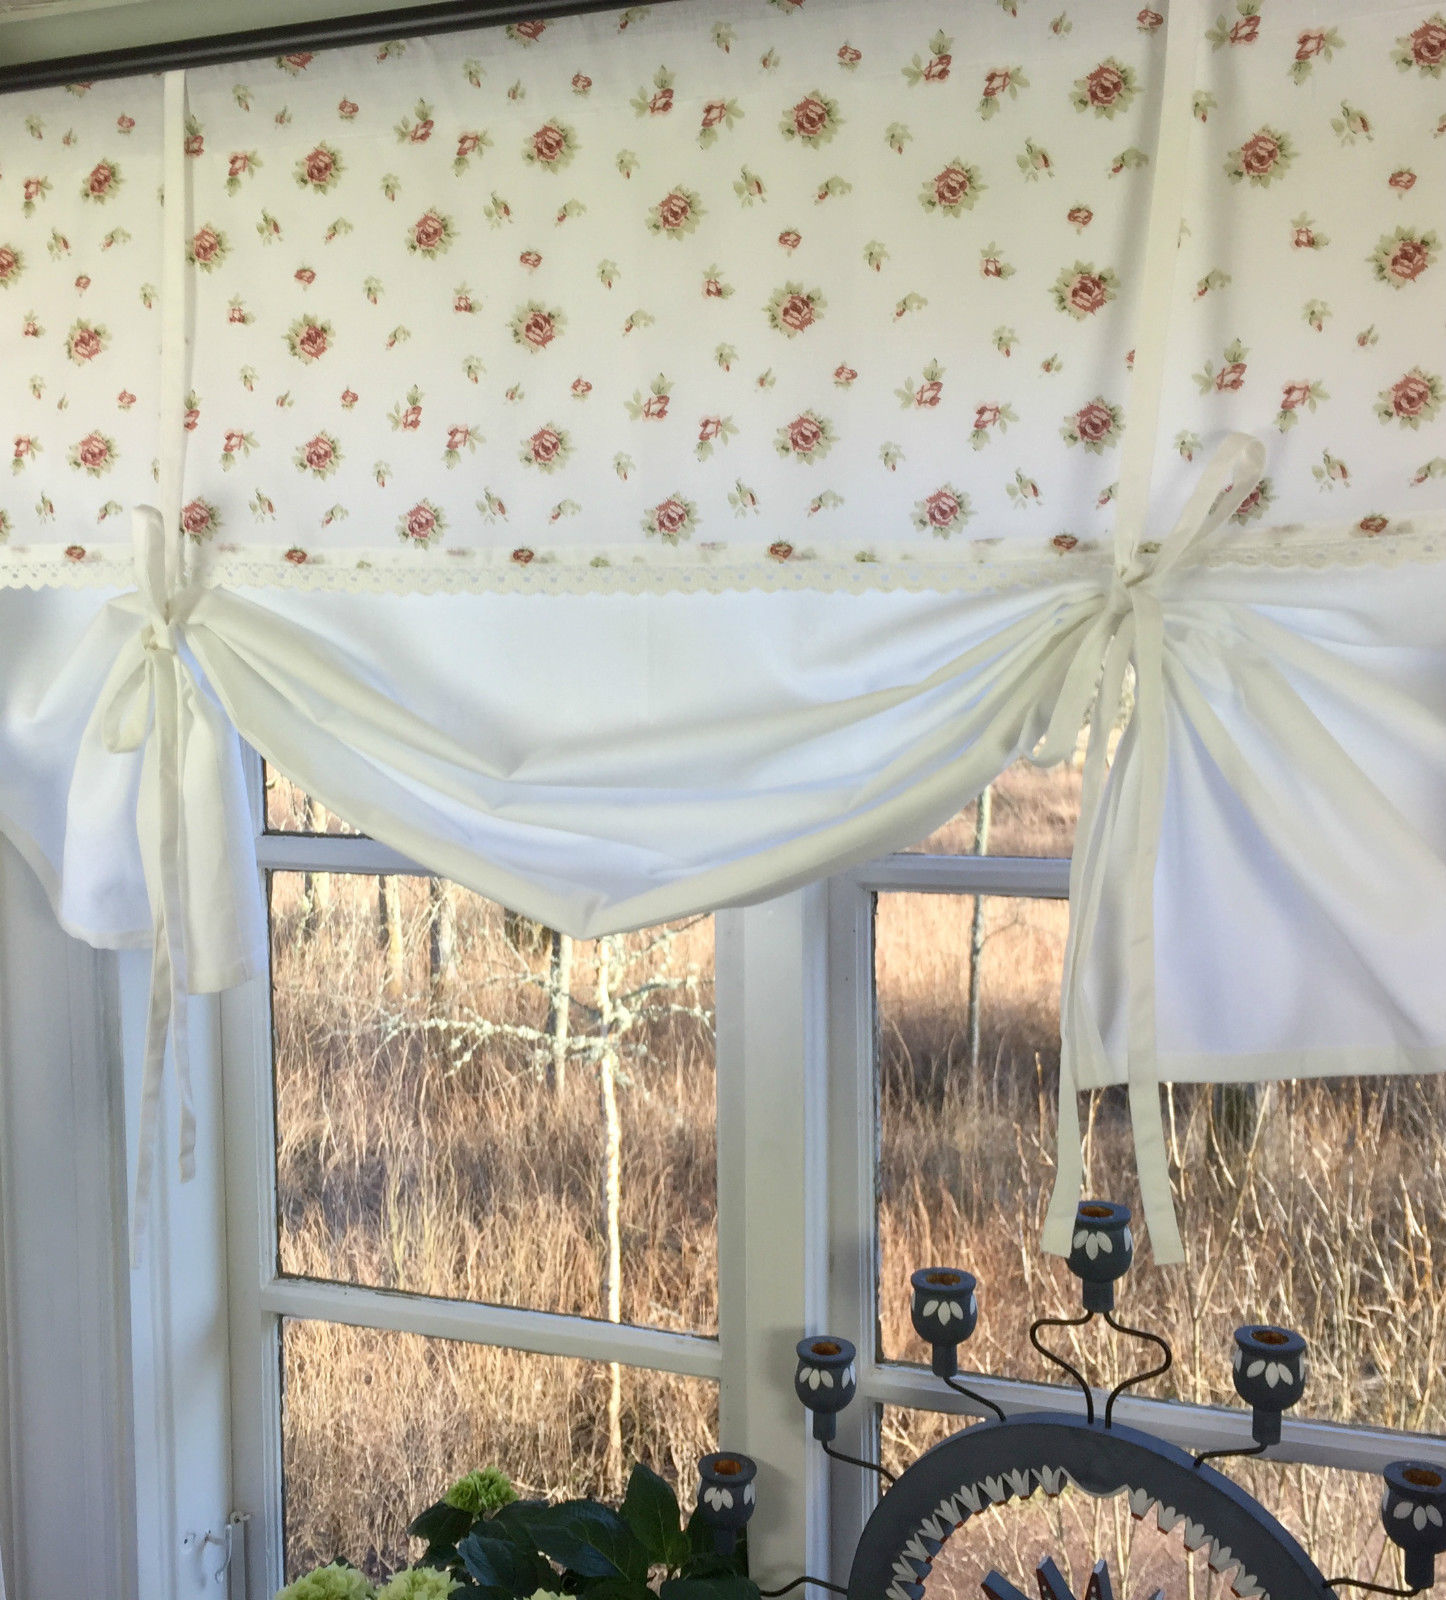 raff gardine lena wei rosen deko 120x90 cm raffgardinen. Black Bedroom Furniture Sets. Home Design Ideas